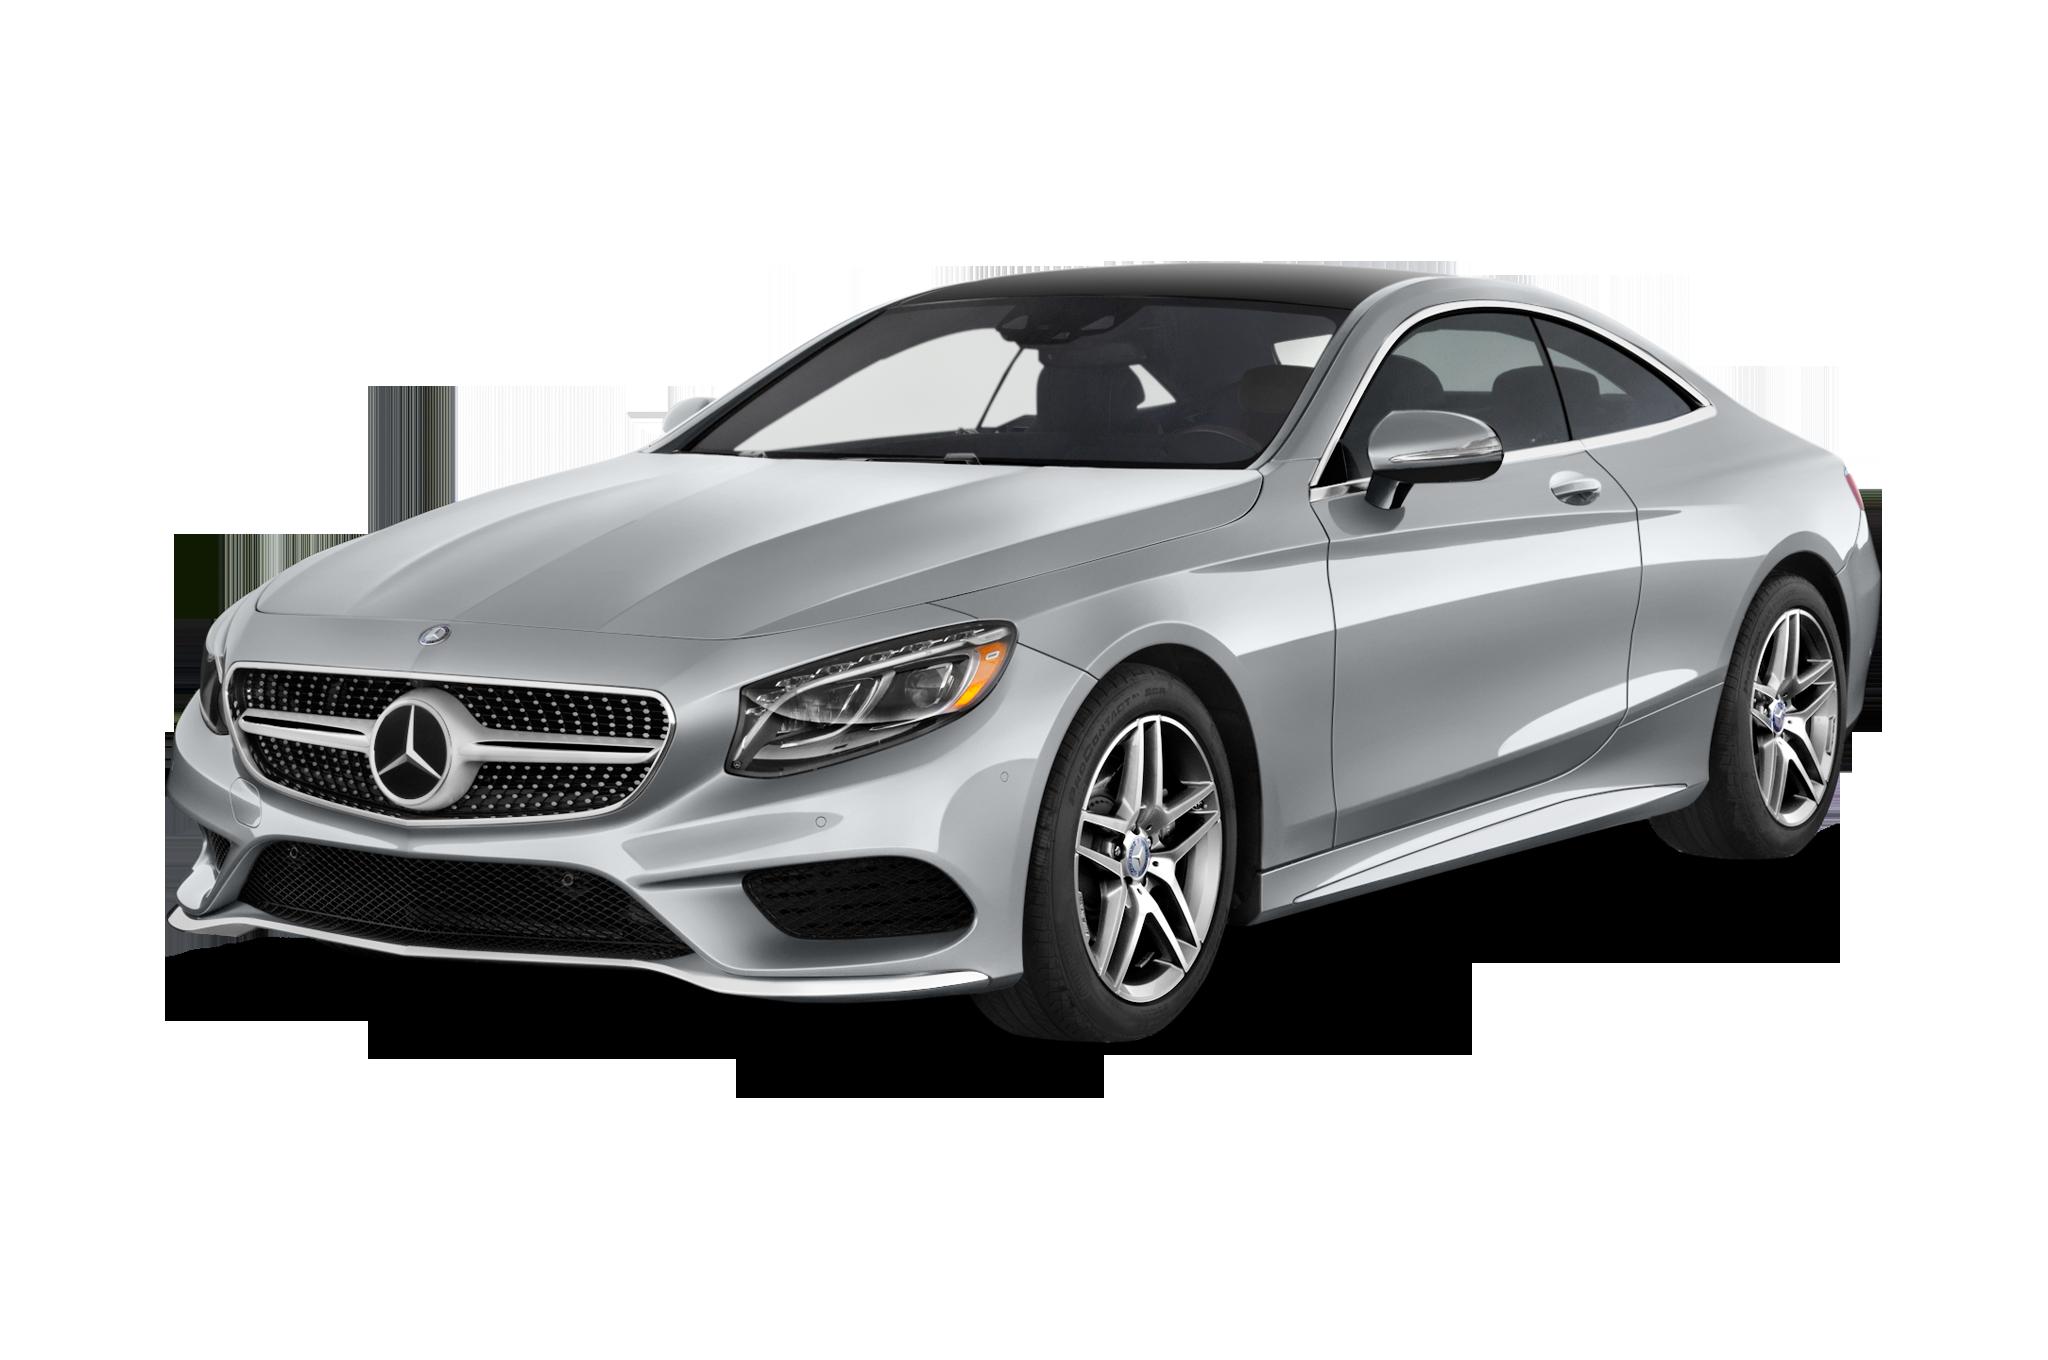 2017 mercedes benz s class mercedes amg s 65 coupe specs for Mercedes benz torrance ca